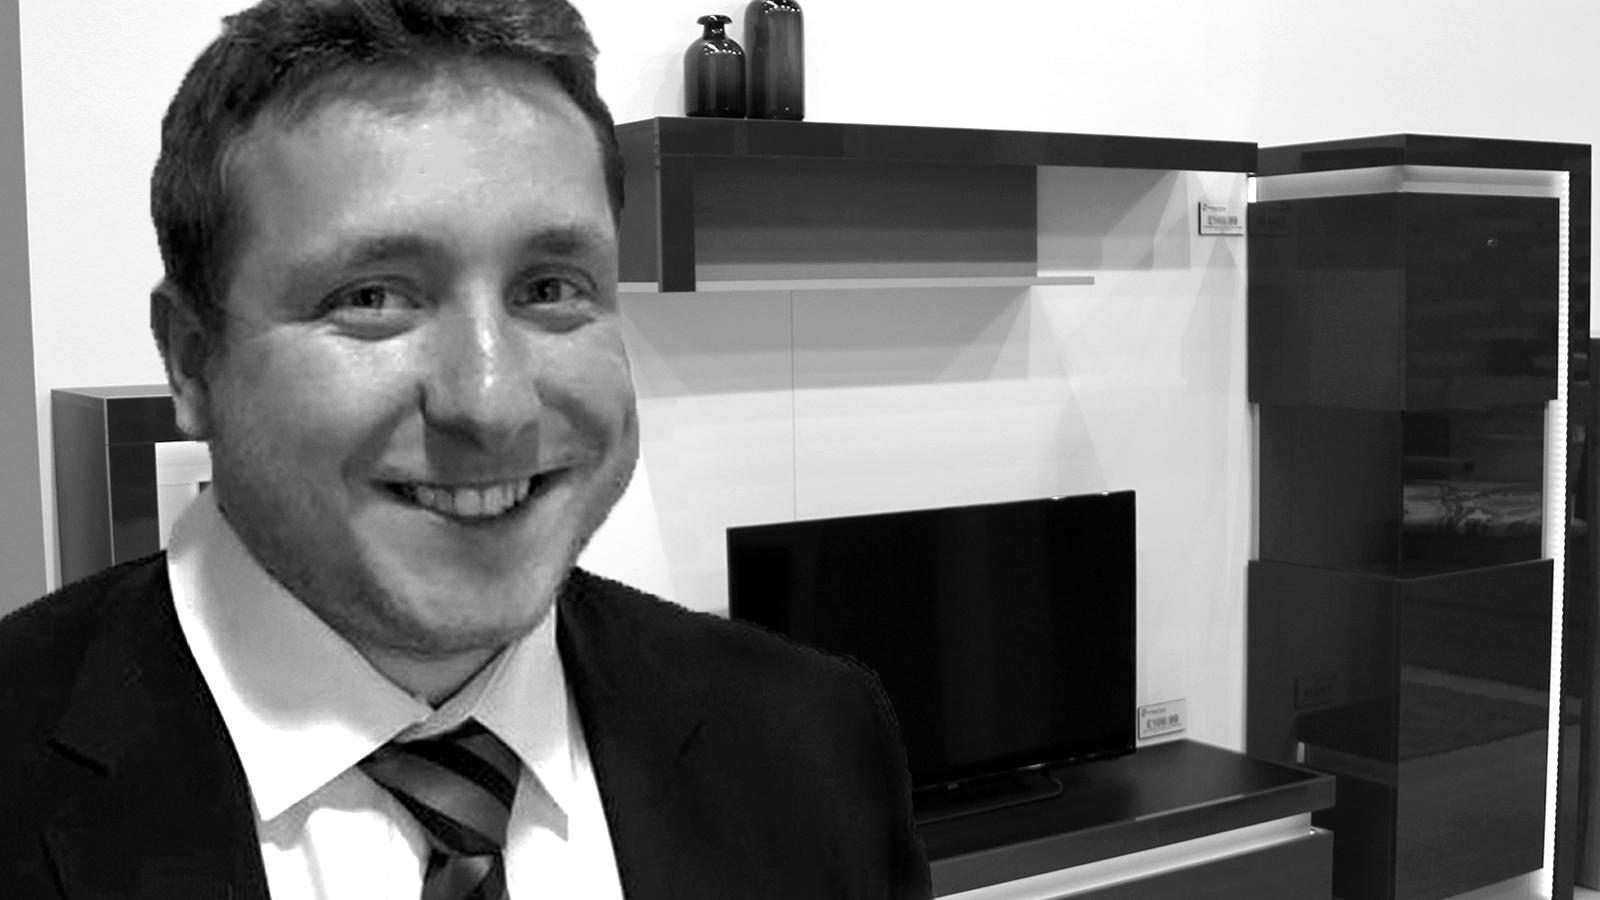 Alex Norris, Strategic Sales & E-Commerce Manager